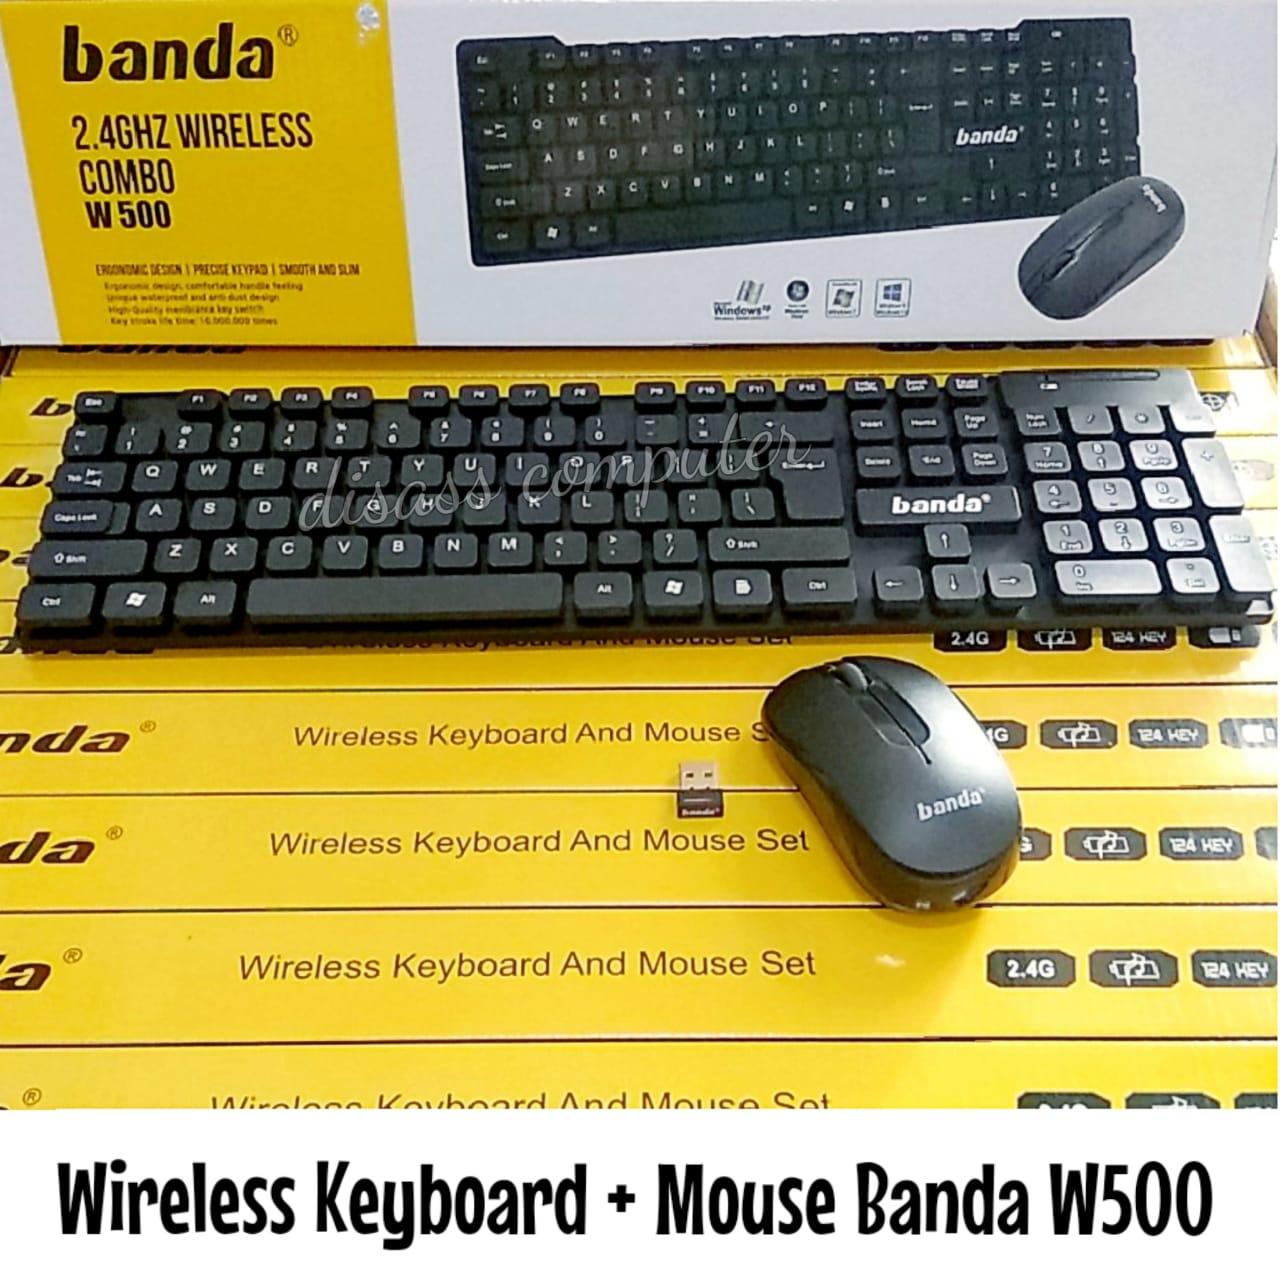 https://www.lazada.co.id/products/keyboard-mouse-wireless-banda-w500-combo-disass-jogja-i1000642949-s1497898037.html